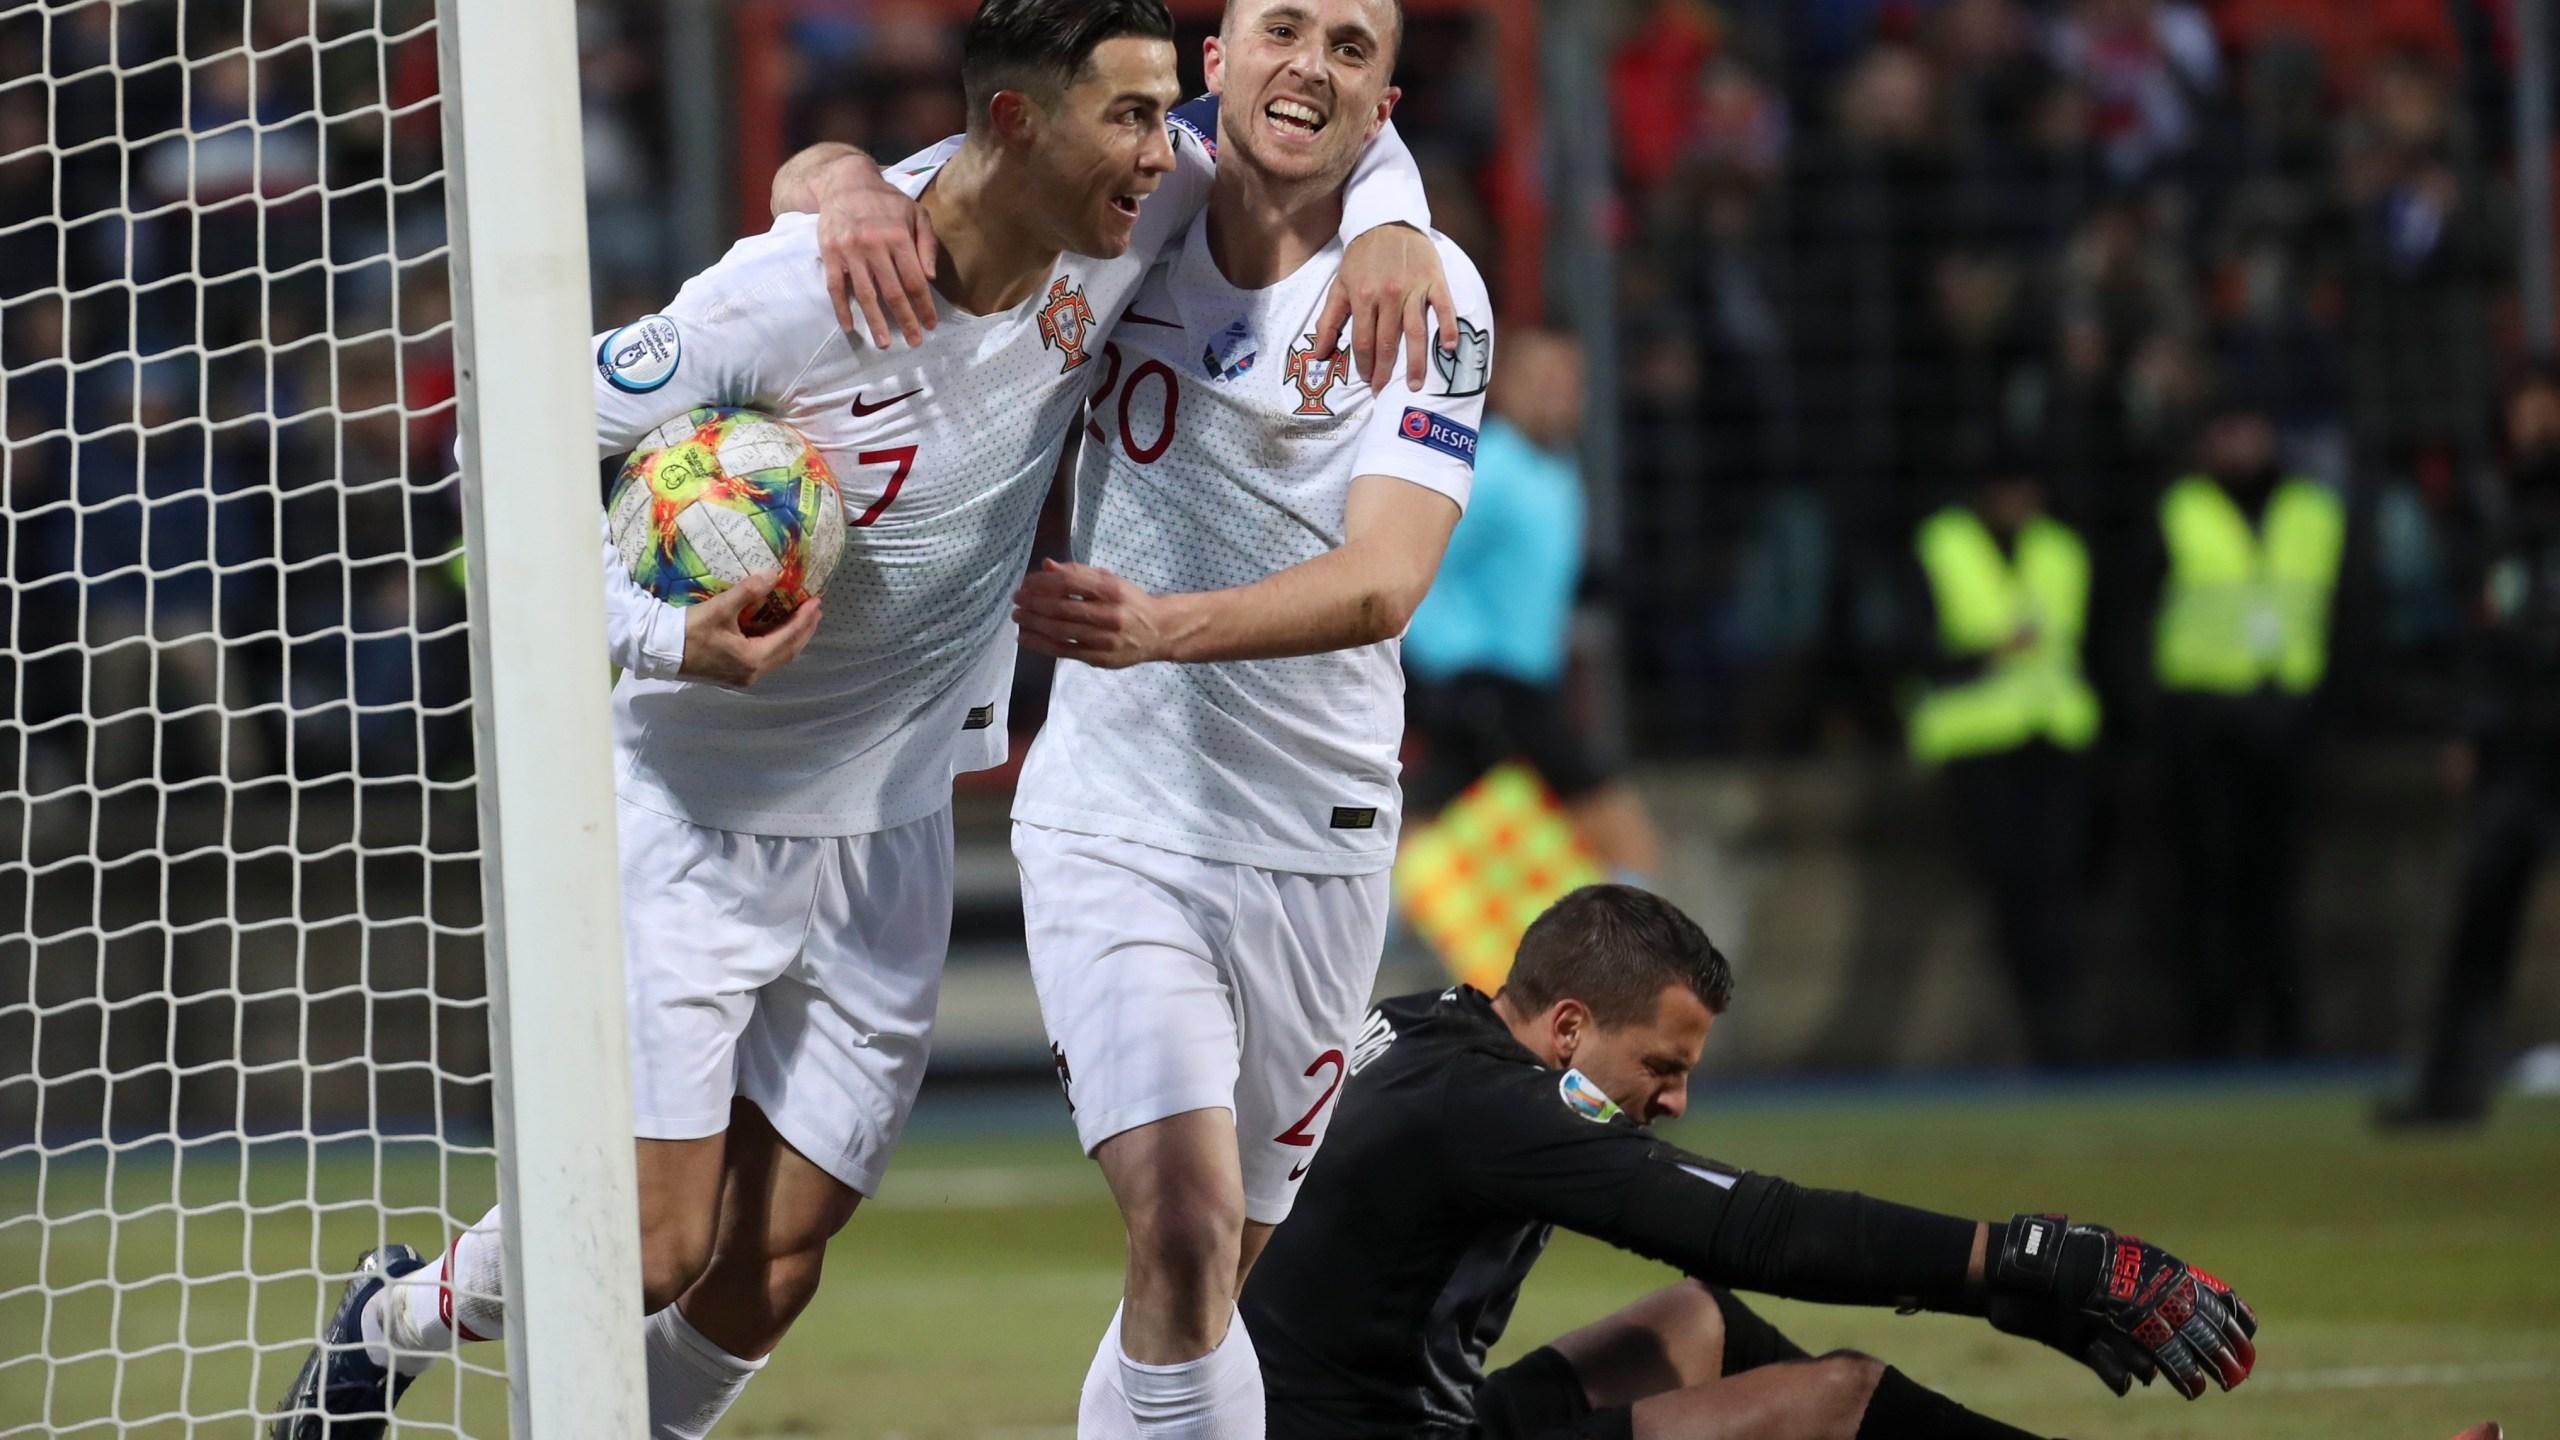 France Portugal Euro 2020 Calendrier.Ronaldo Stuck On 99 Goals But Portugal Through To Euro 2020